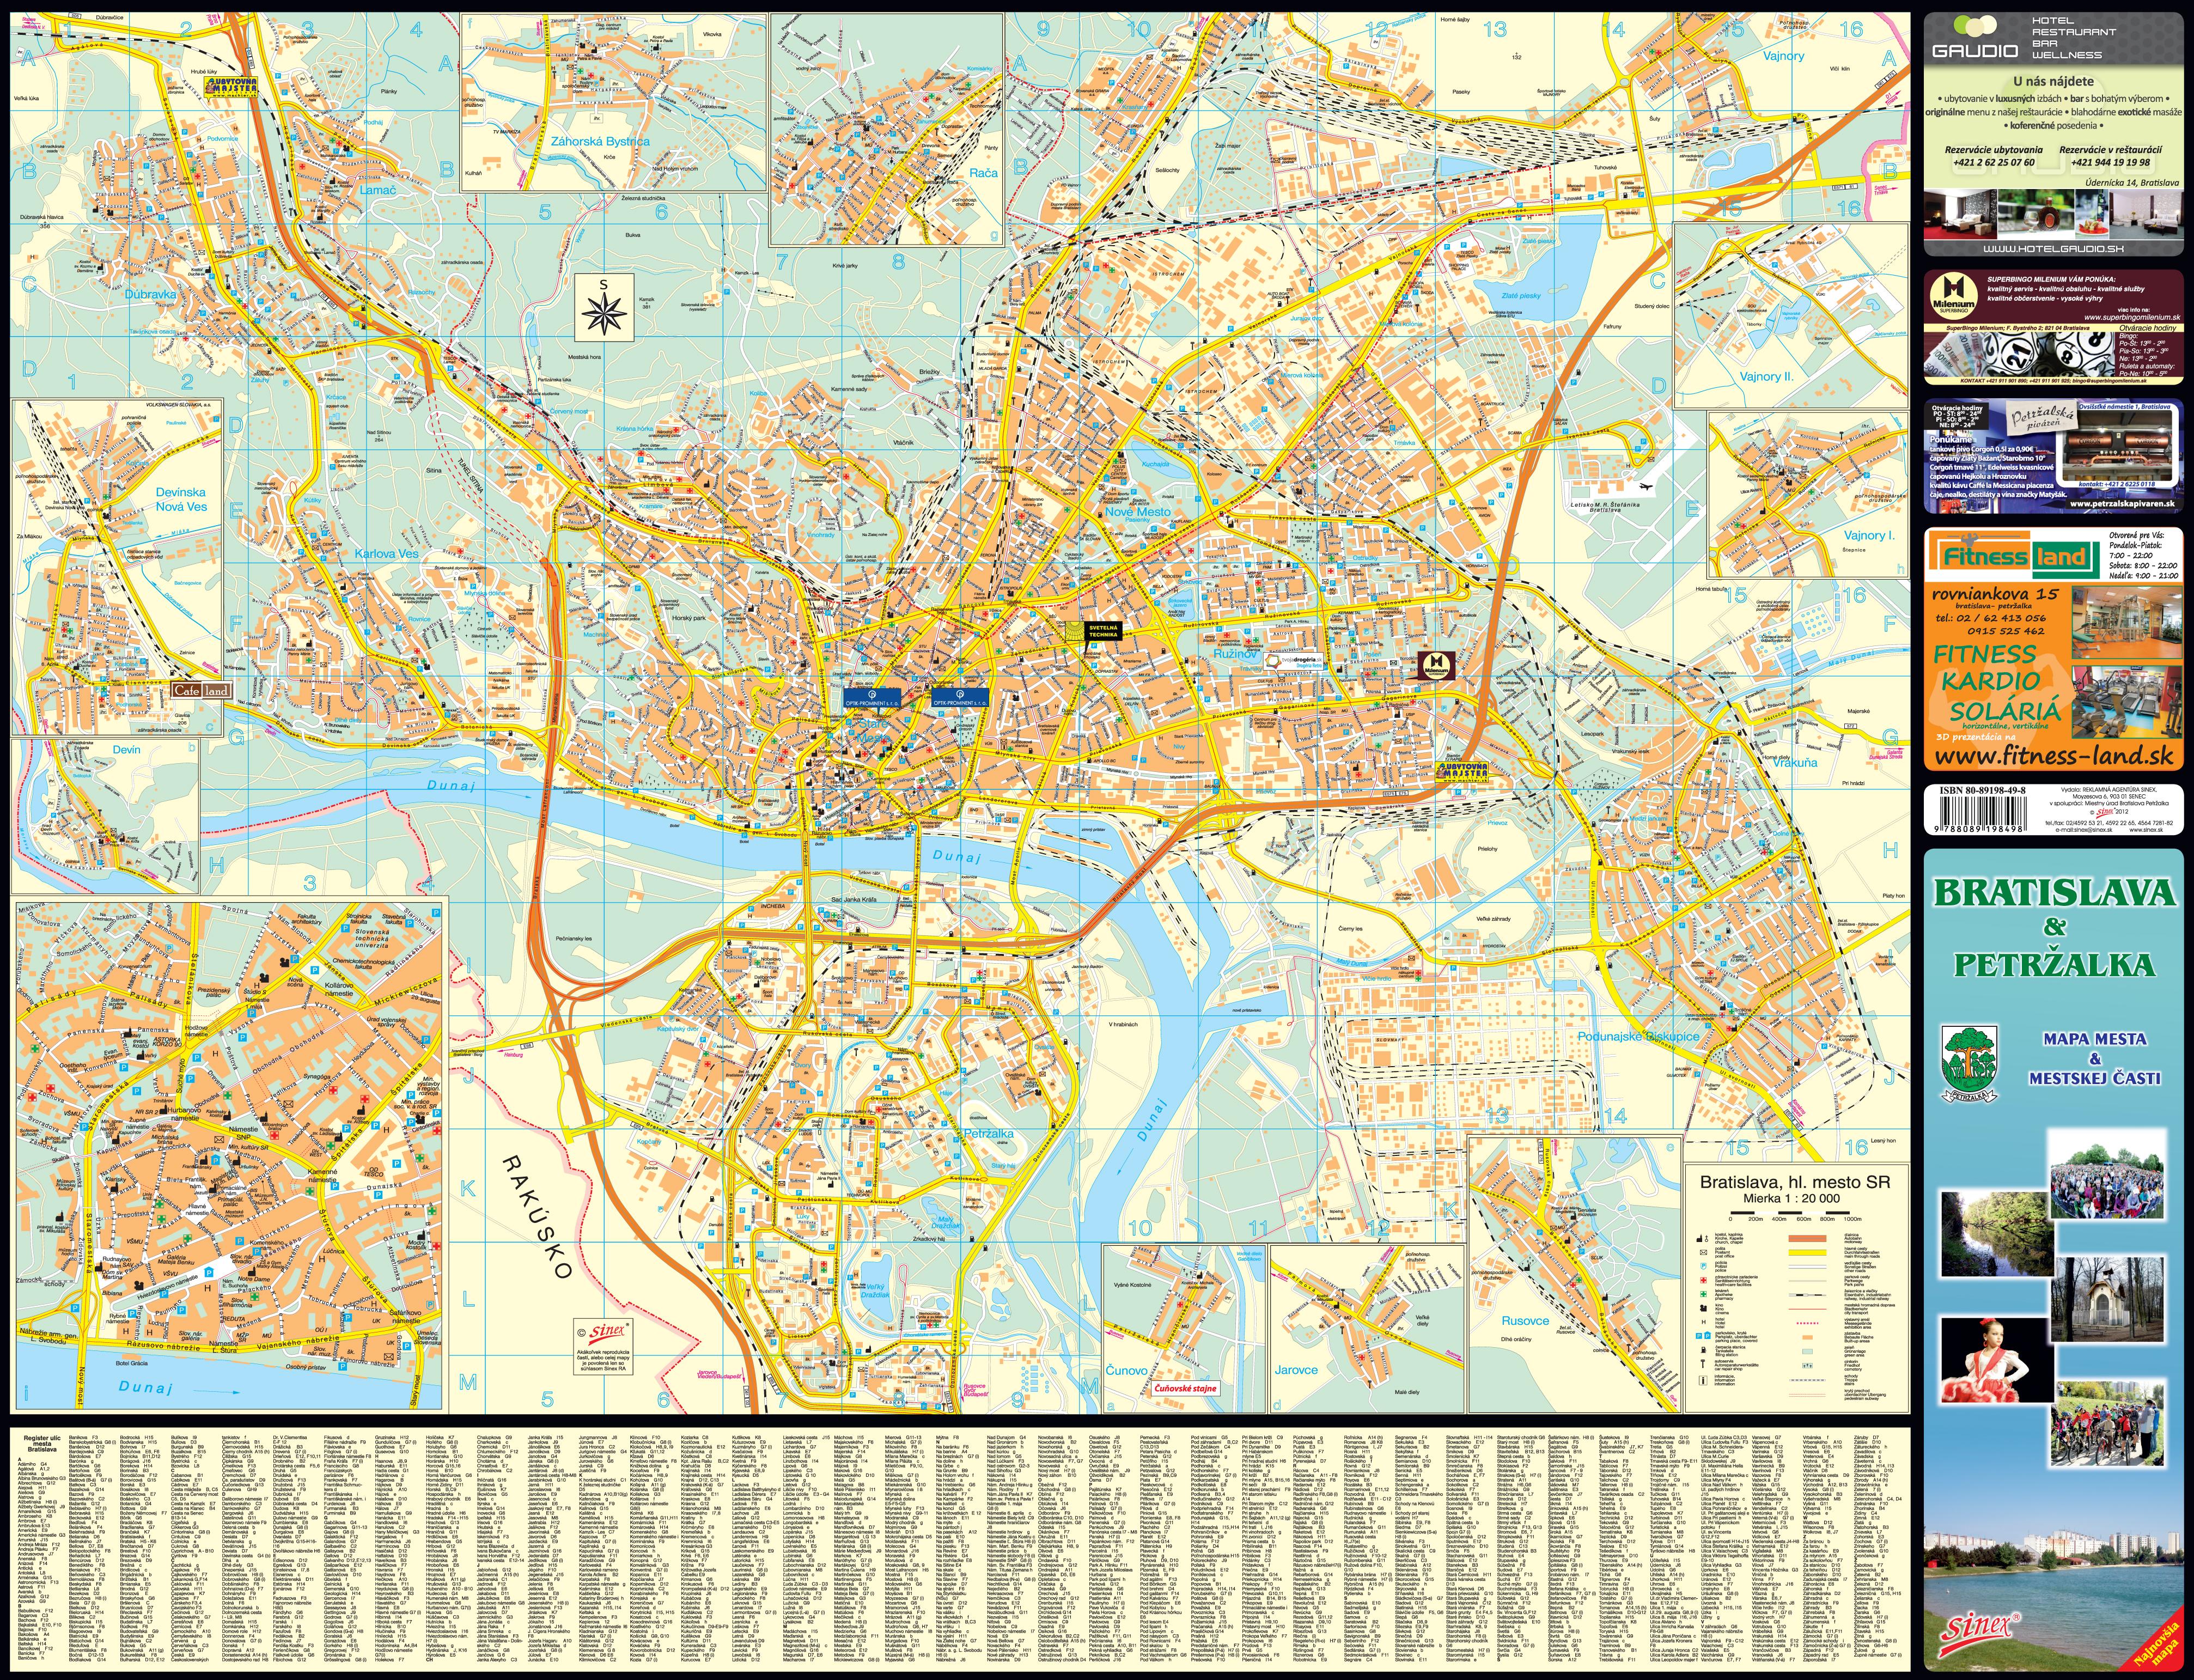 bratislava mapa Mapy   Petržalka bratislava mapa